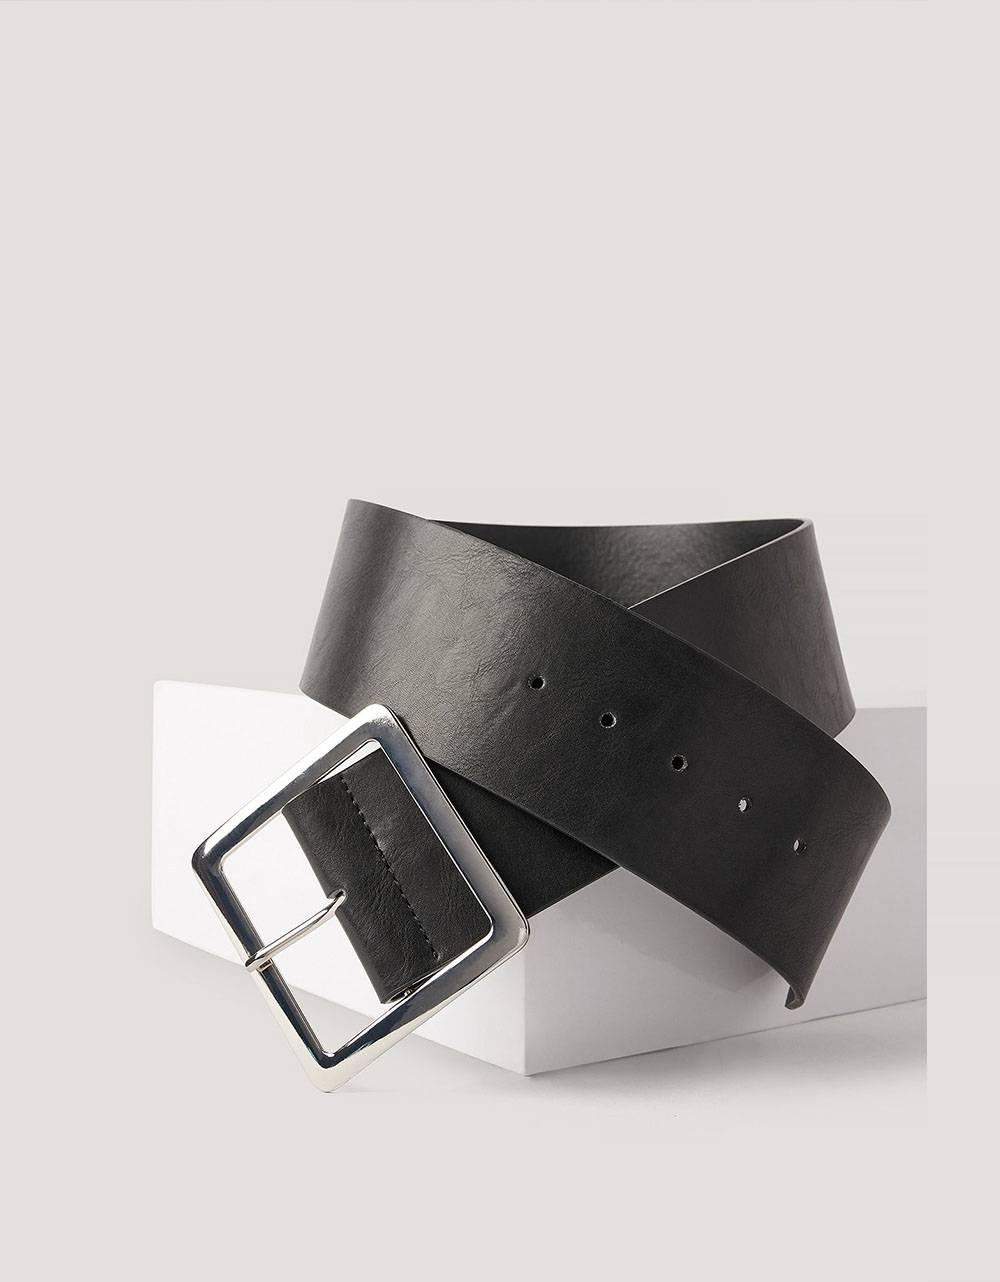 NA-KD big buckle waist belt - black NA-KD ACCESSORIES 16,39€